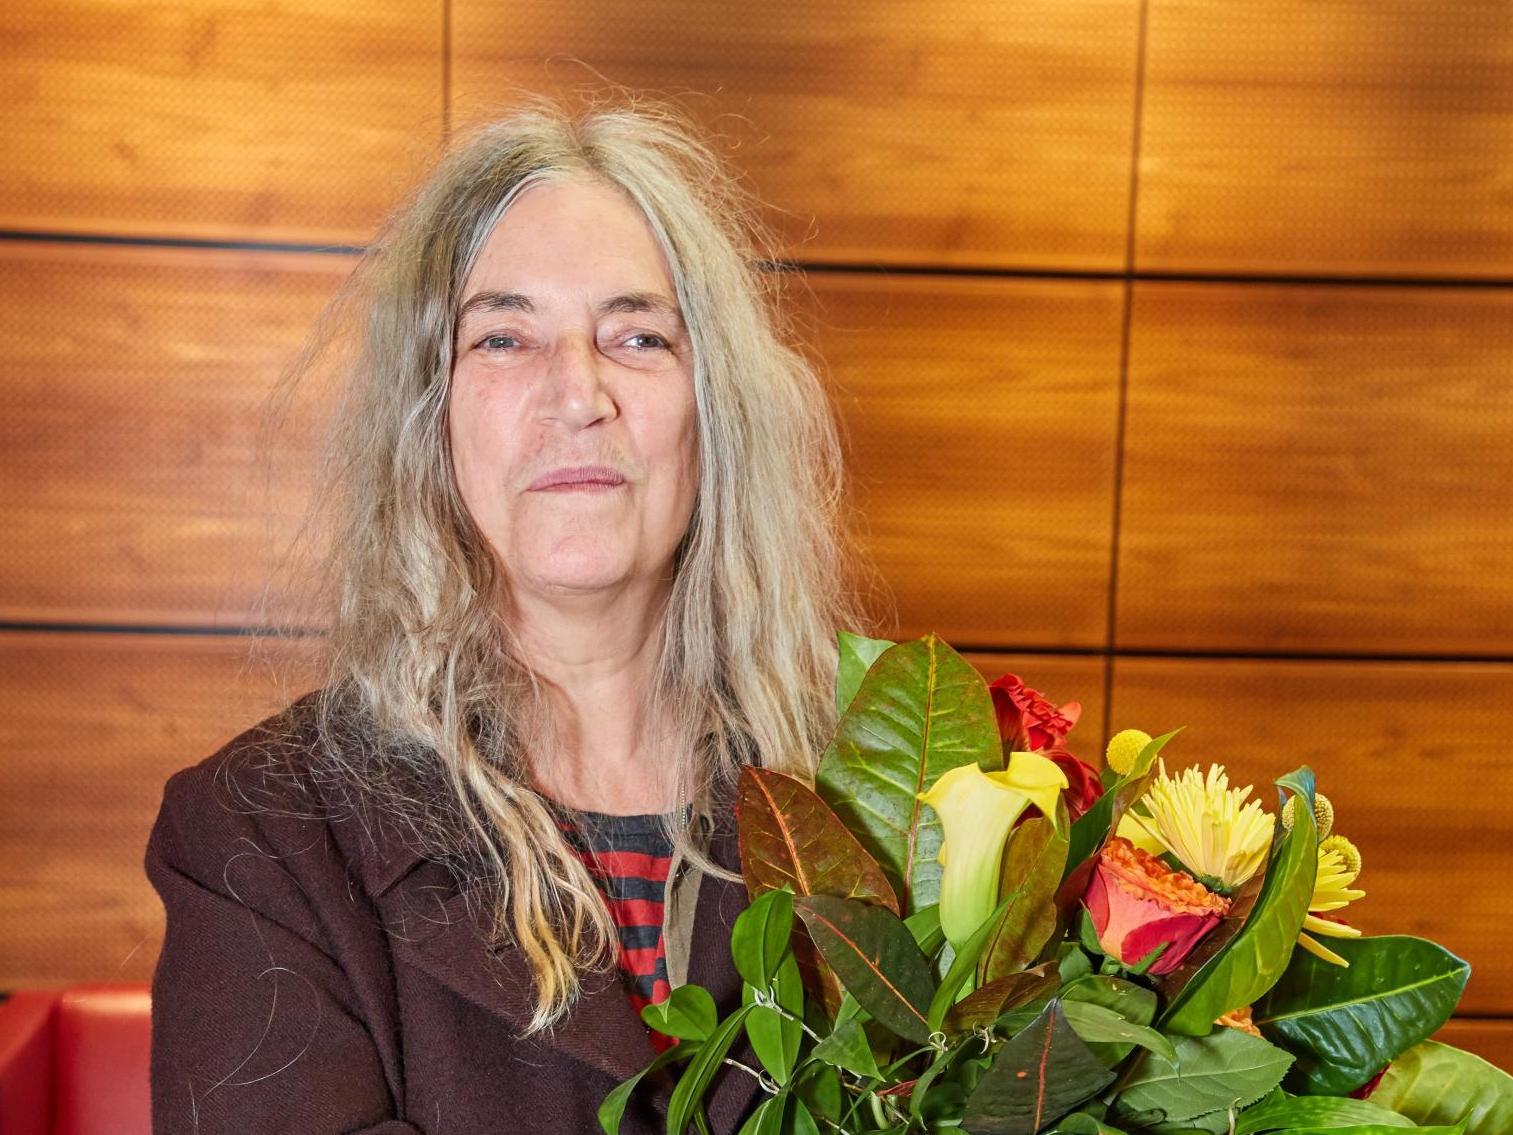 Patti Smith interview: 'Mozart was a punk rocker' | The